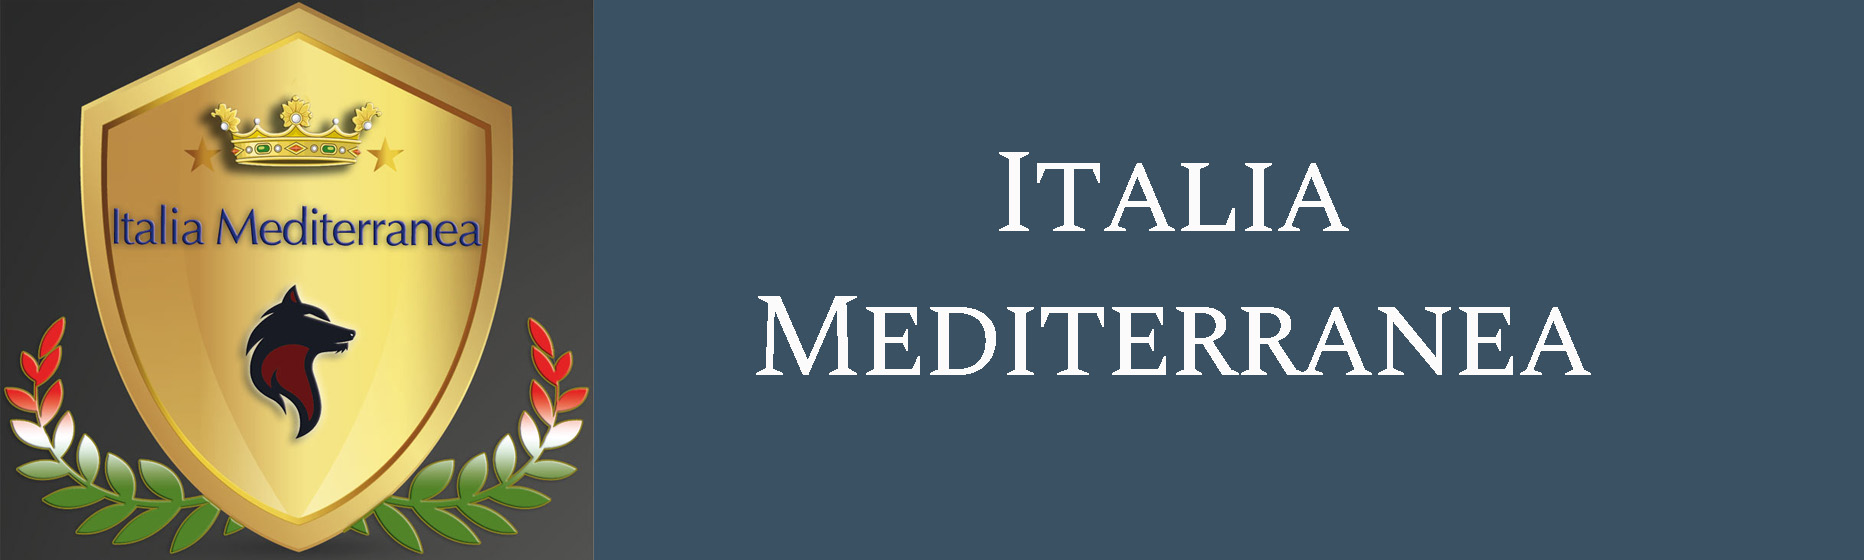 Italia Mediterranea